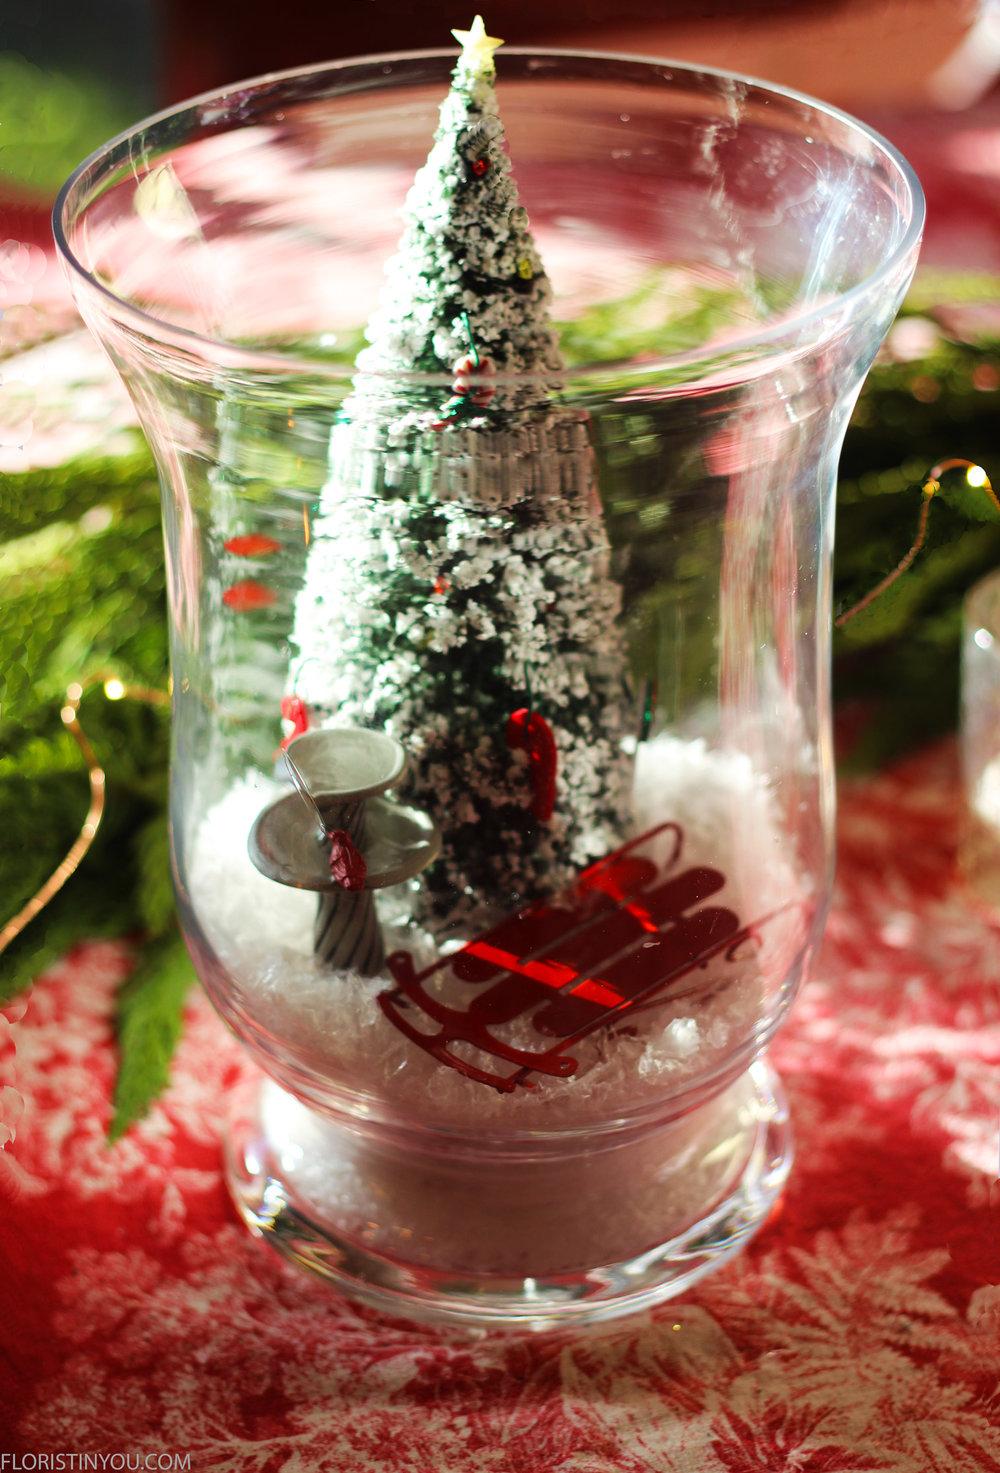 "Perfect Christmas Centerpiece                     Normal   0           false   false   false     EN-US   JA   X-NONE                                                                                                                                                                                                                                                                                                                                                                              /* Style Definitions */ table.MsoNormalTable {mso-style-name:""Table Normal""; mso-tstyle-rowband-size:0; mso-tstyle-colband-size:0; mso-style-noshow:yes; mso-style-priority:99; mso-style-parent:""""; mso-padding-alt:0in 5.4pt 0in 5.4pt; mso-para-margin:0in; mso-para-margin-bottom:.0001pt; mso-pagination:widow-orphan; font-size:12.0pt; font-family:Cambria; mso-ascii-font-family:Cambria; mso-ascii-theme-font:minor-latin; mso-hansi-font-family:Cambria; mso-hansi-theme-font:minor-latin;}"